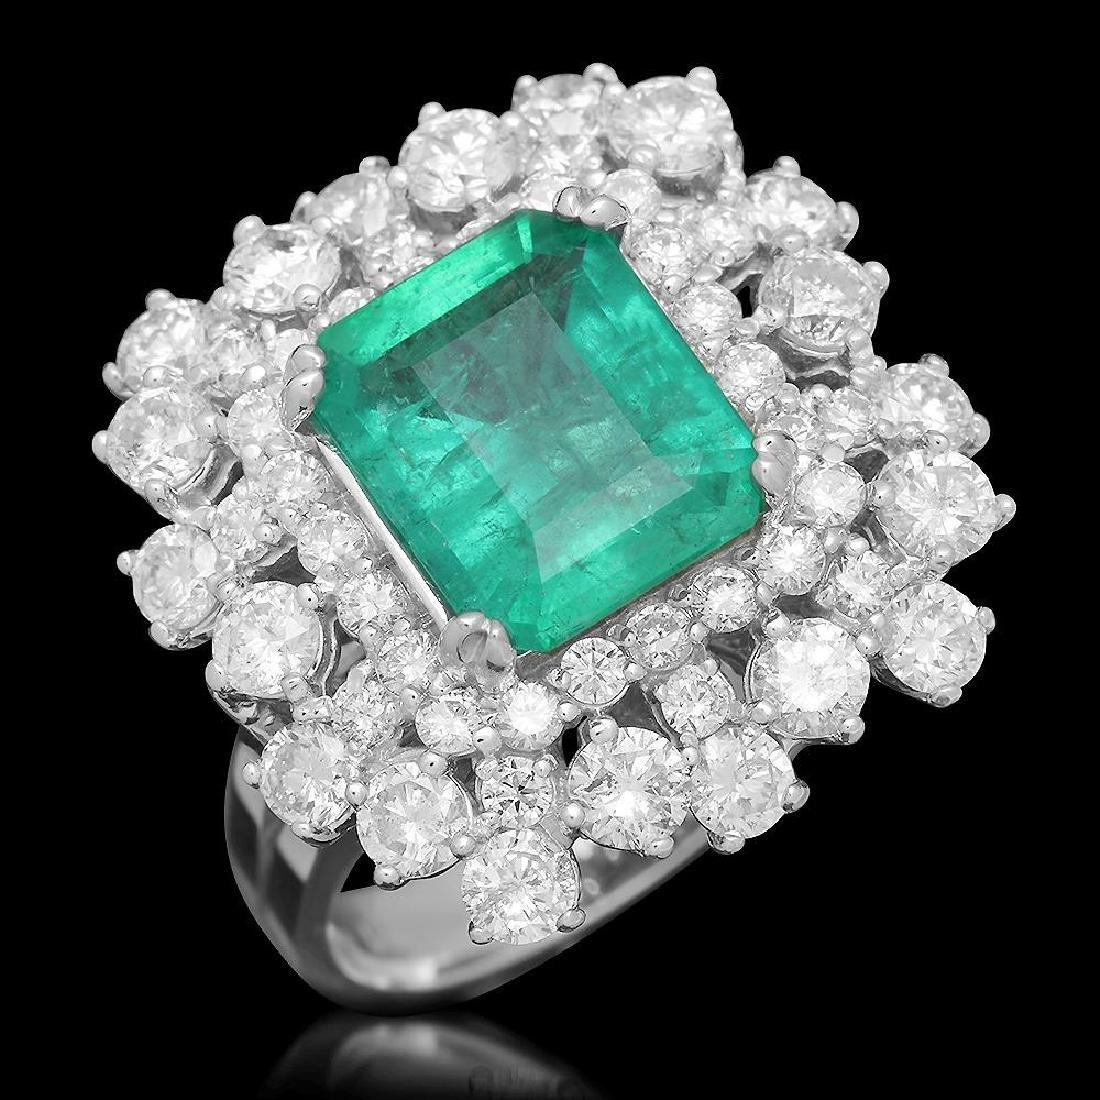 14K Gold 2.90 Emerald 2.71 Diamond Ring